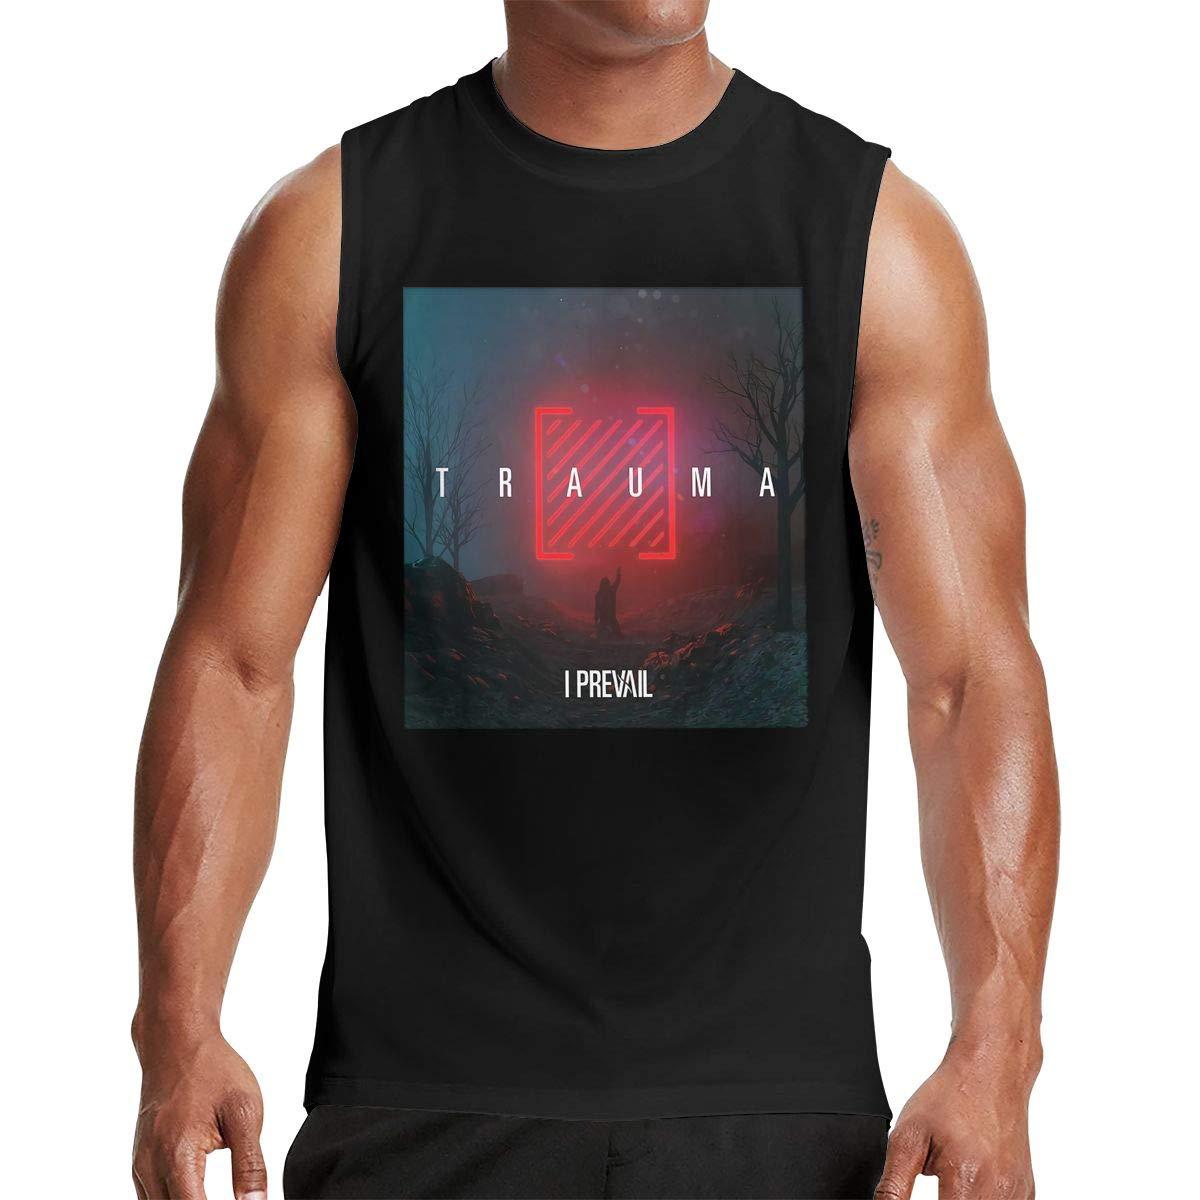 Thomlarryca I Prevail Trauma S Gym Muscle T Shirt Classic Athletic Sleeveless T Shirts